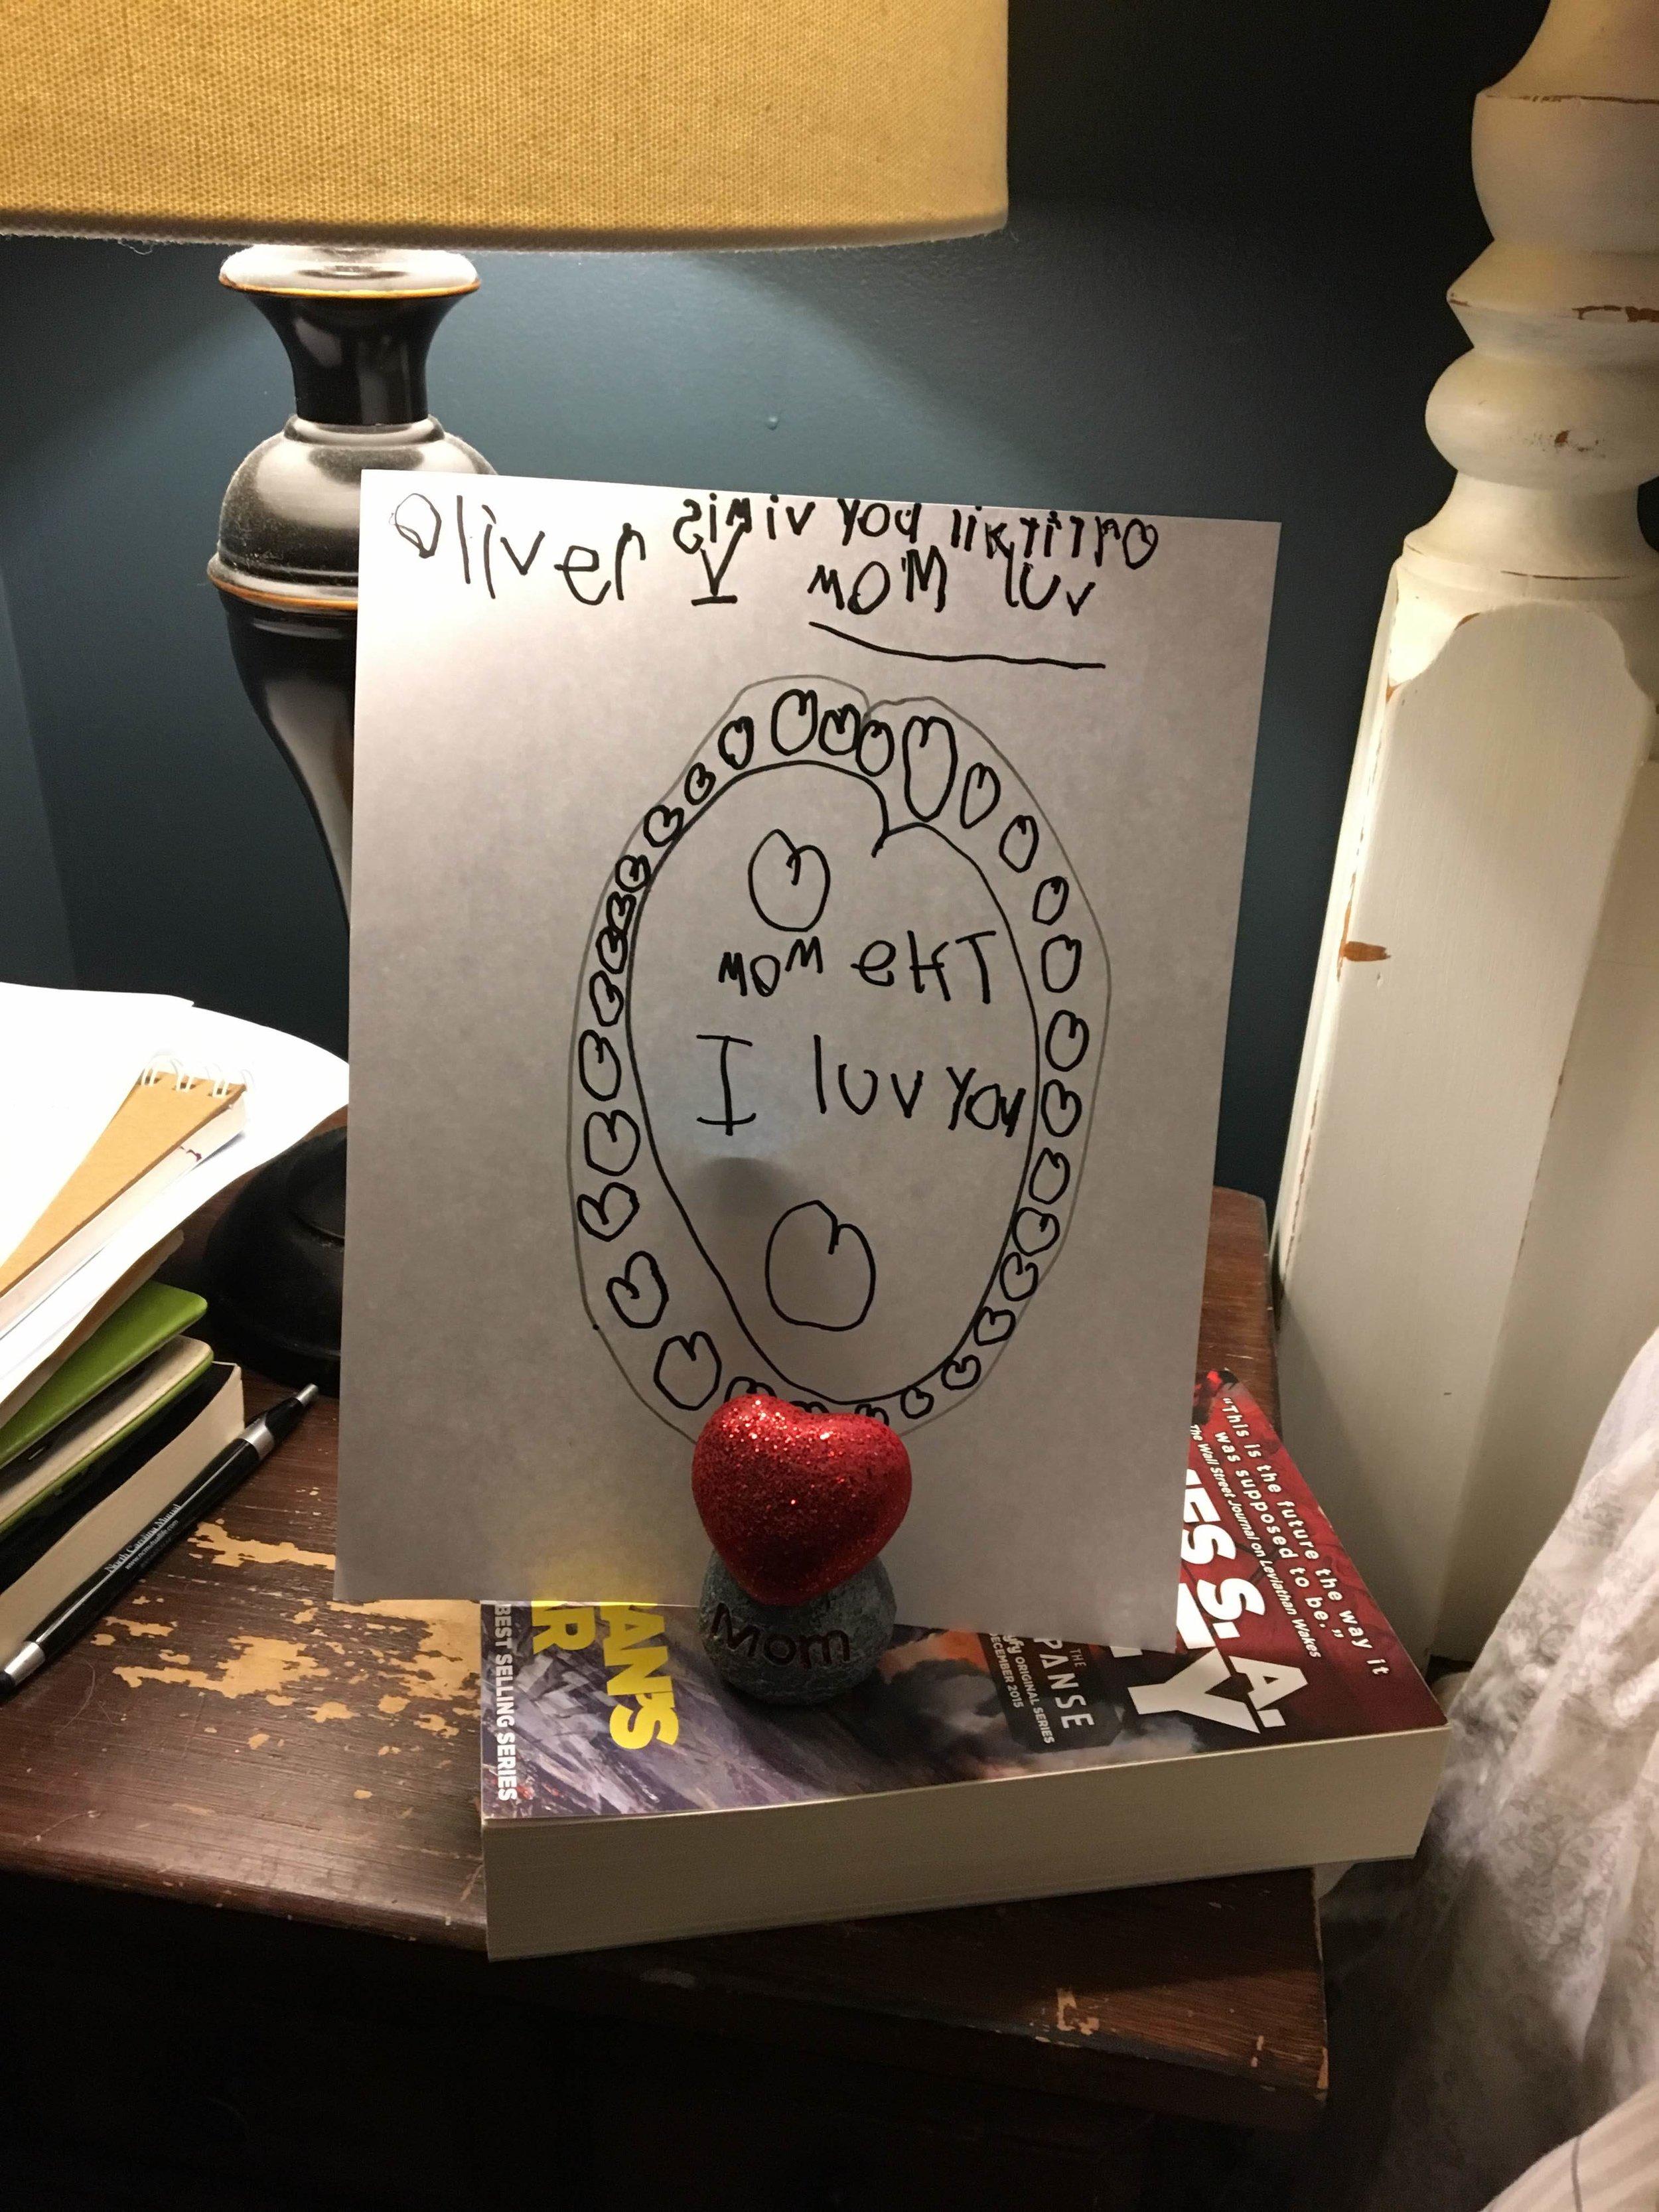 oliver writing